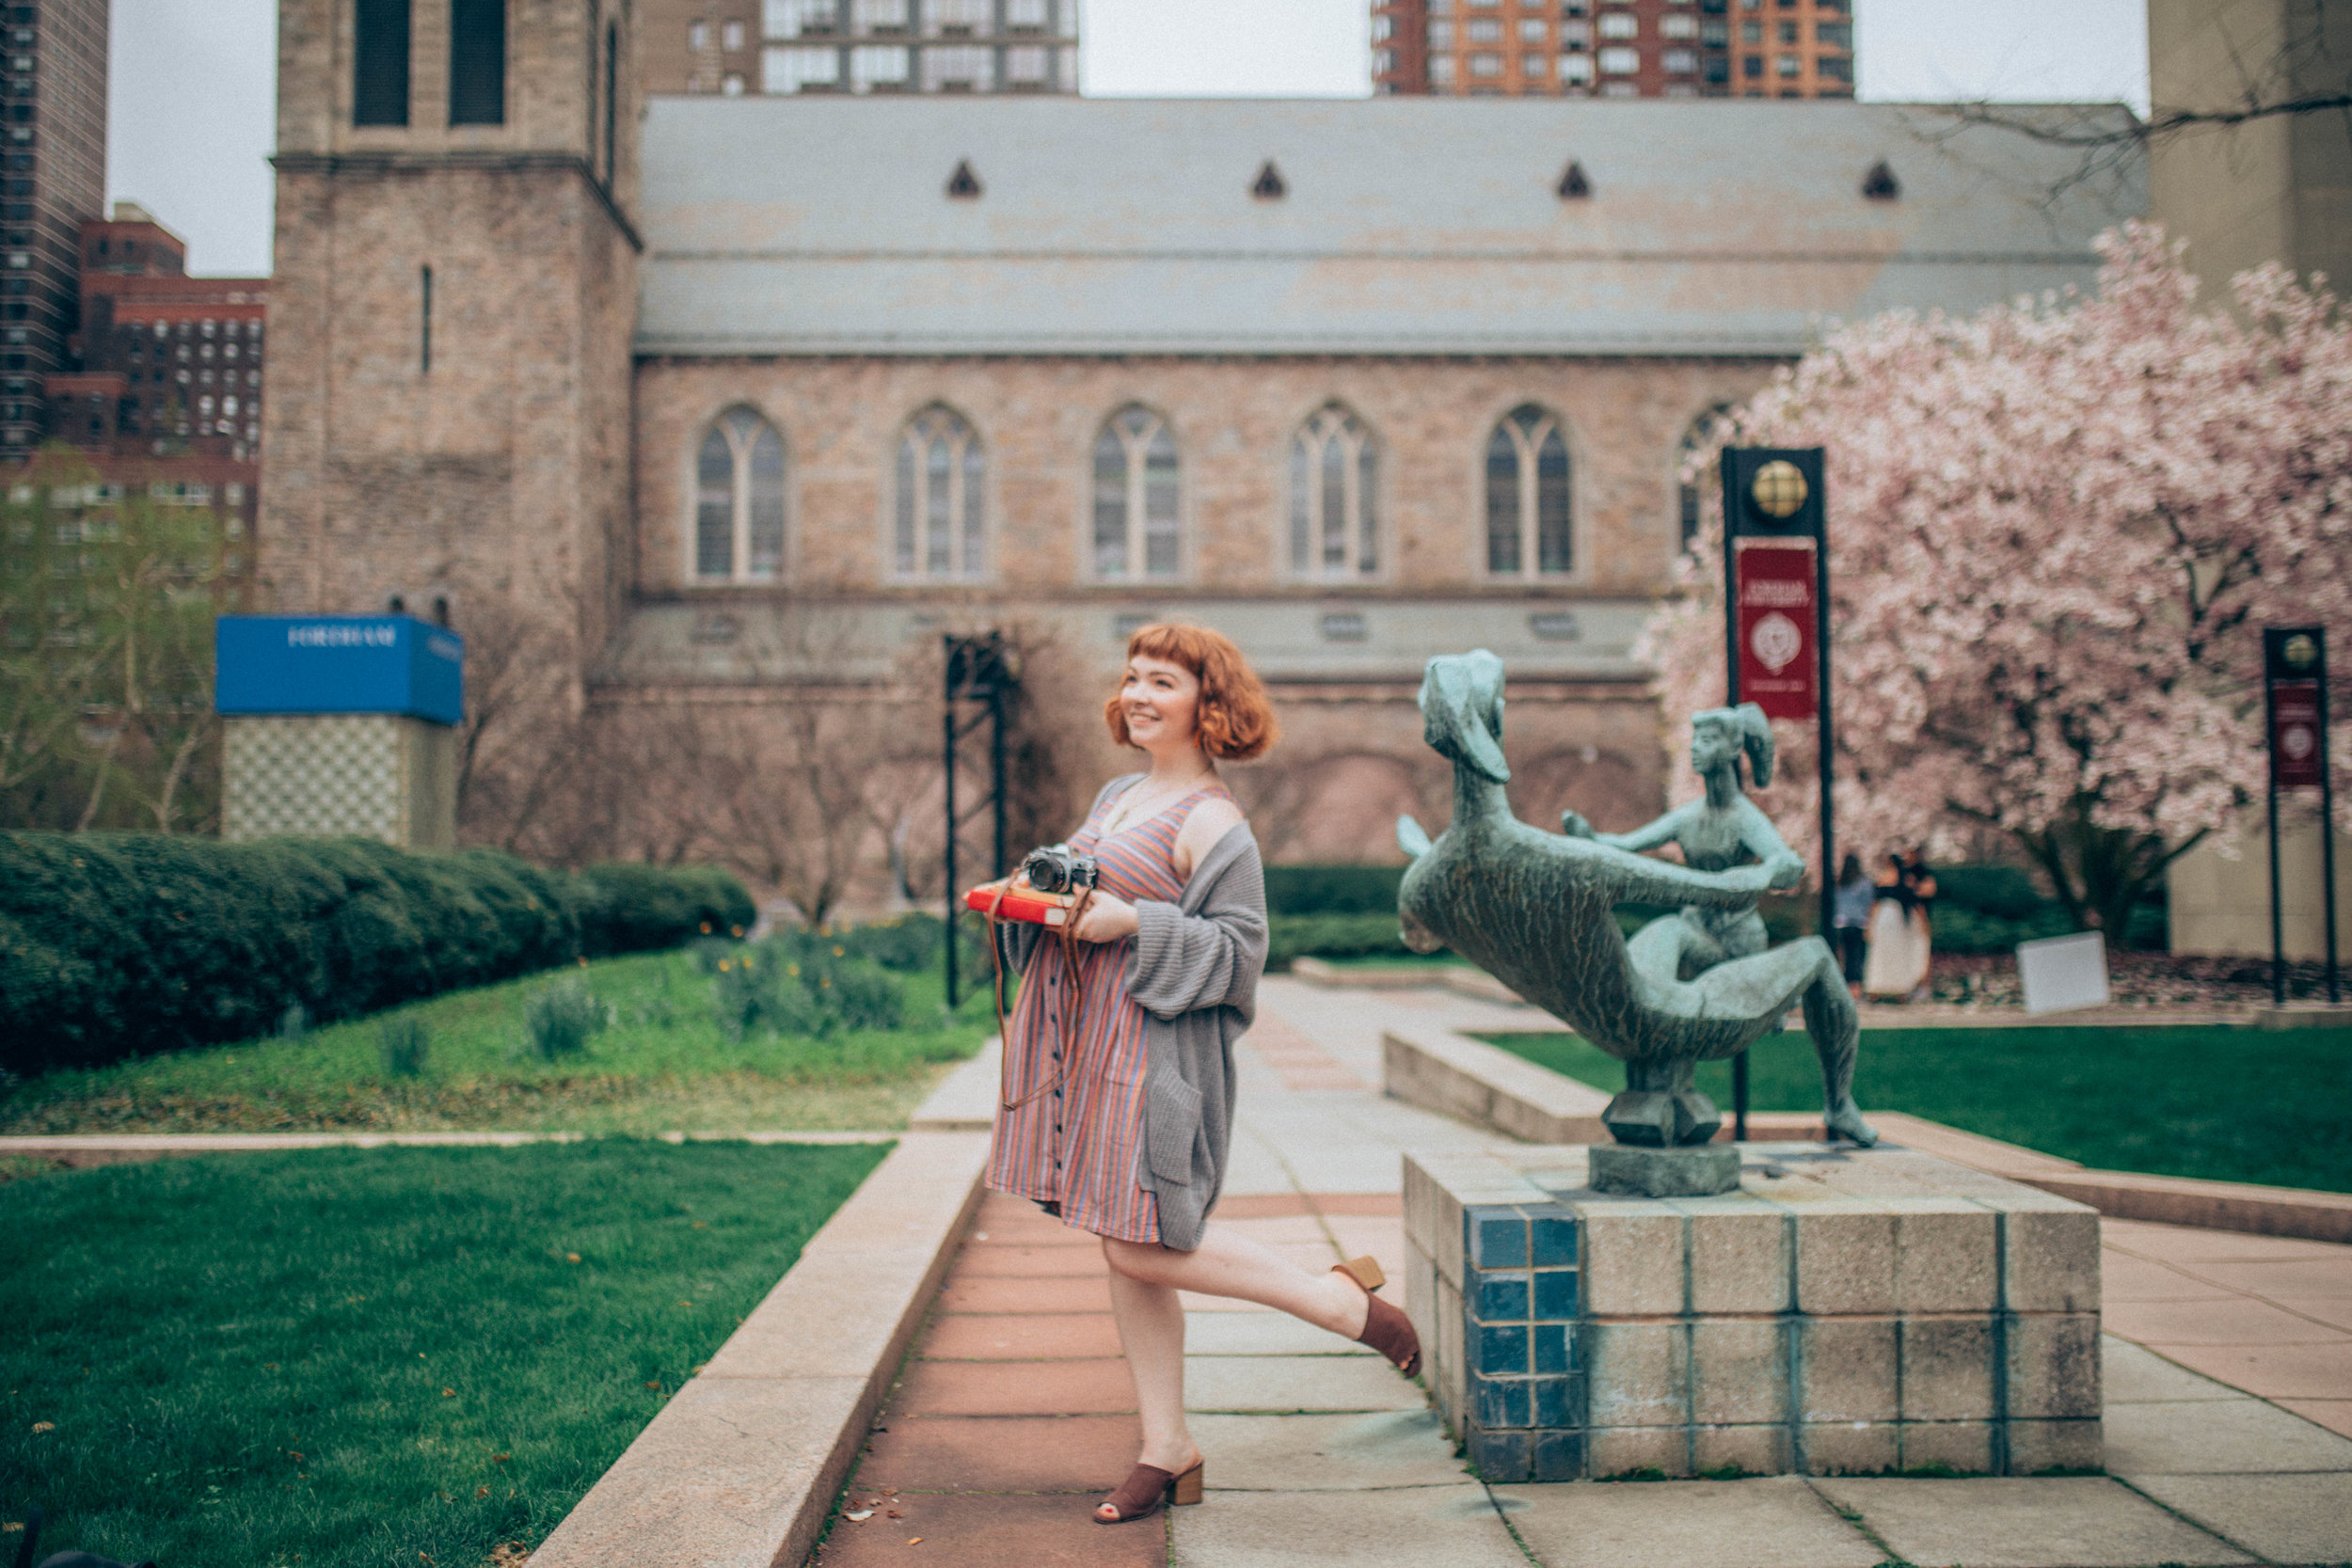 new_york_city_graduation_photographer (14 of 26).jpg